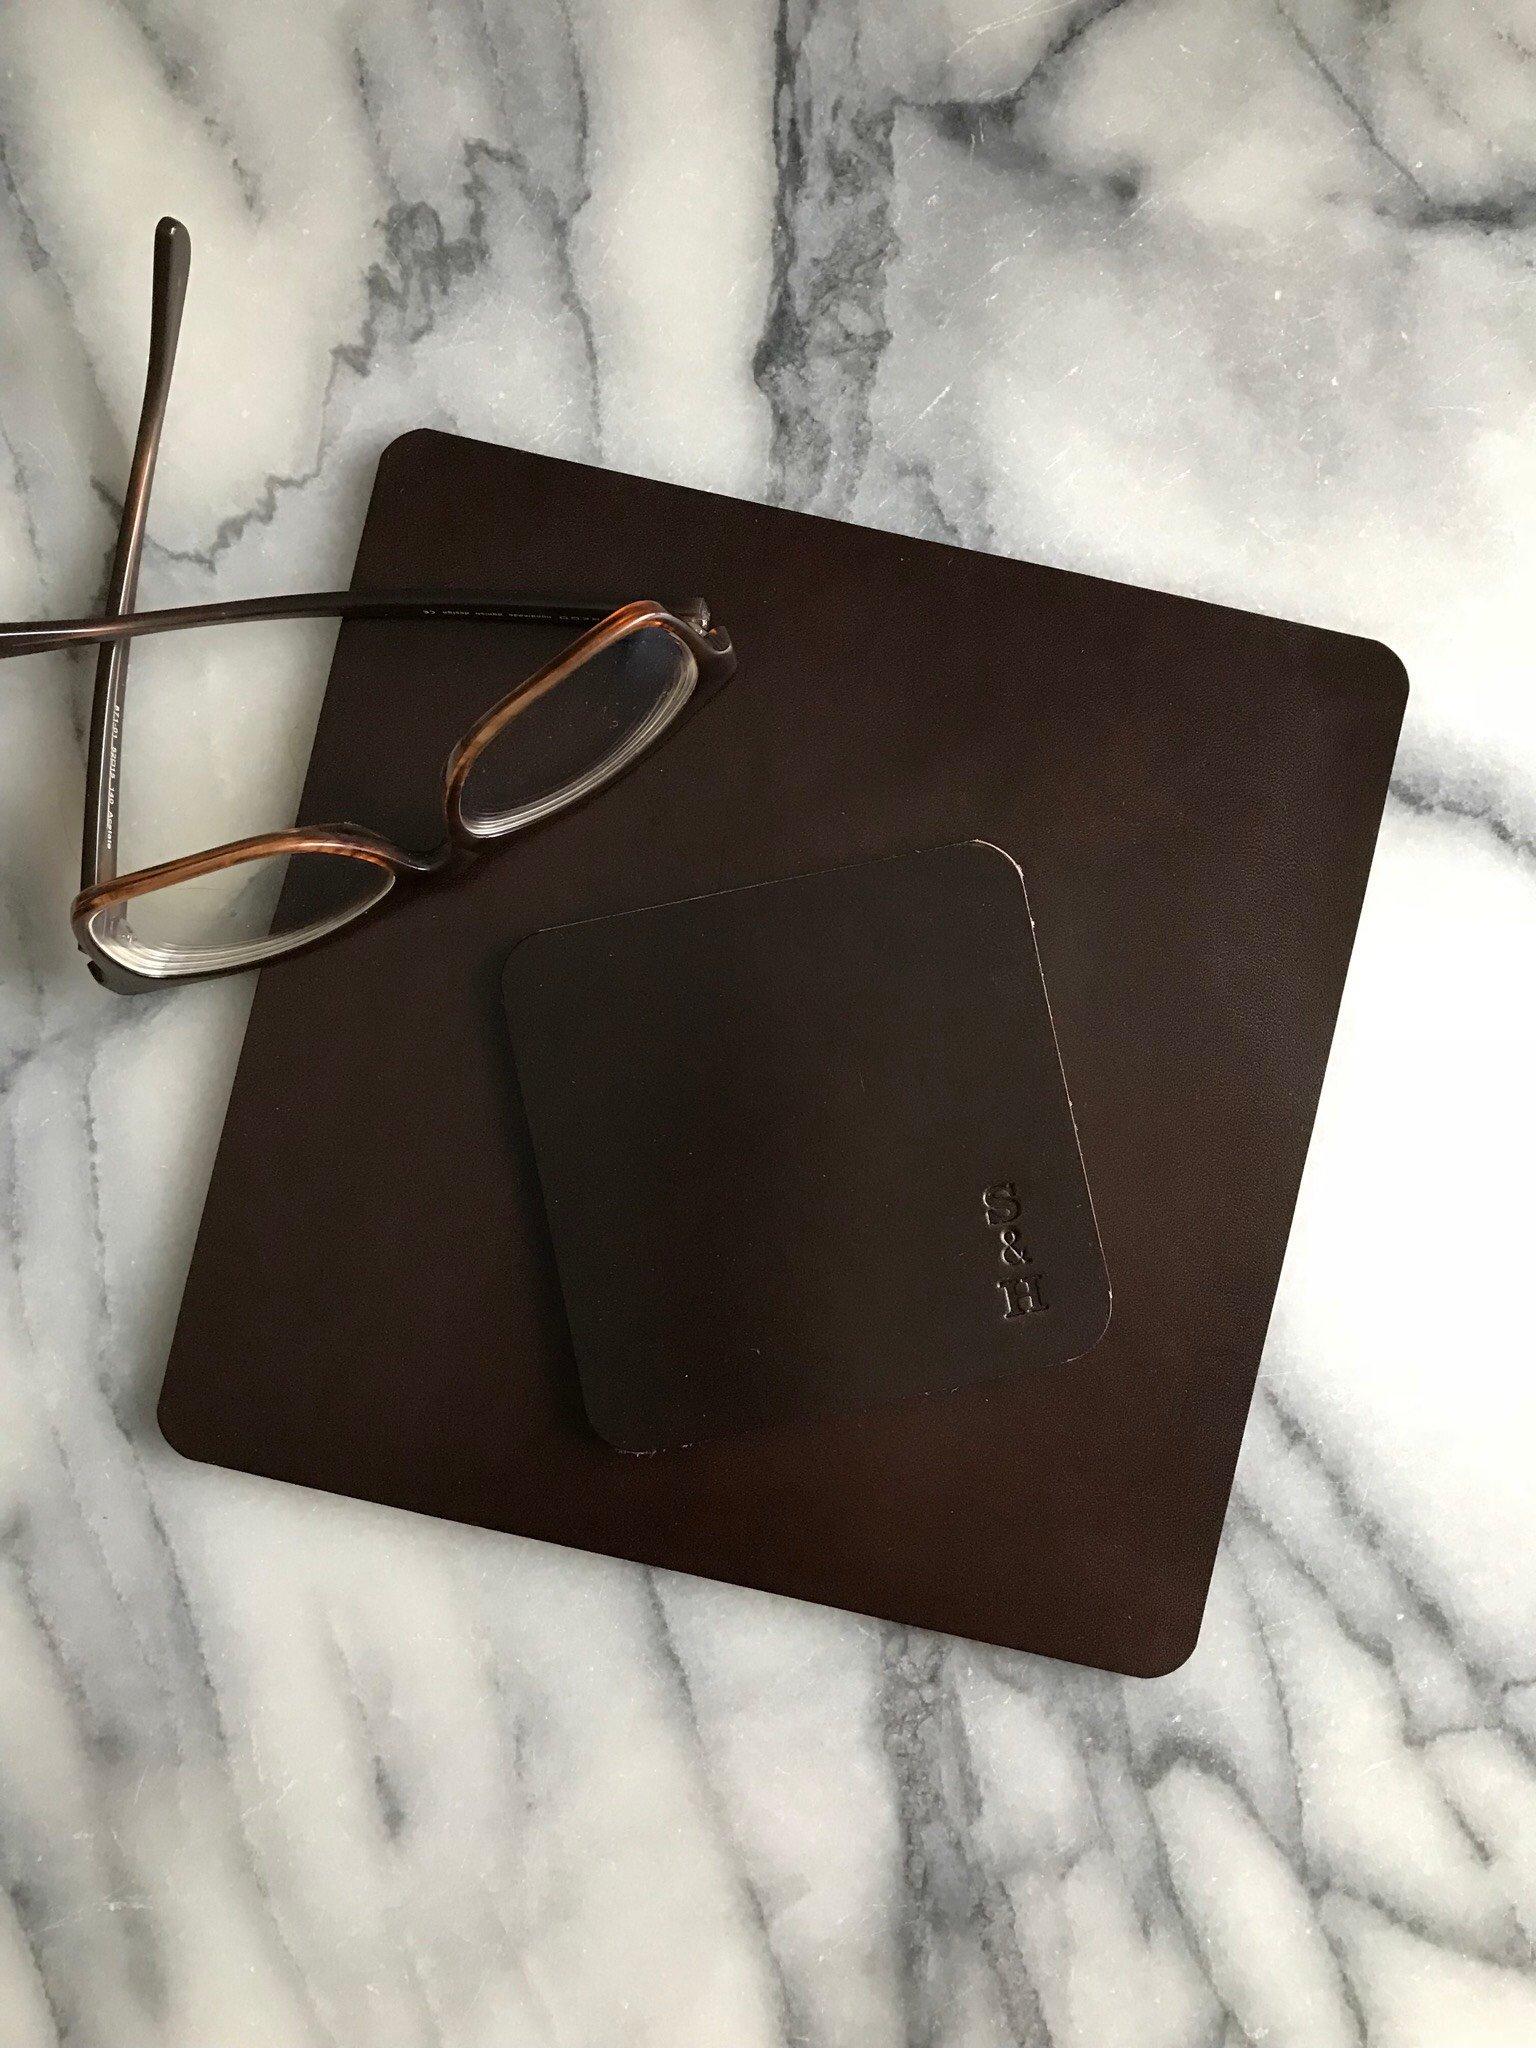 Leather Mouse Pad Brown - Musmatta i läder